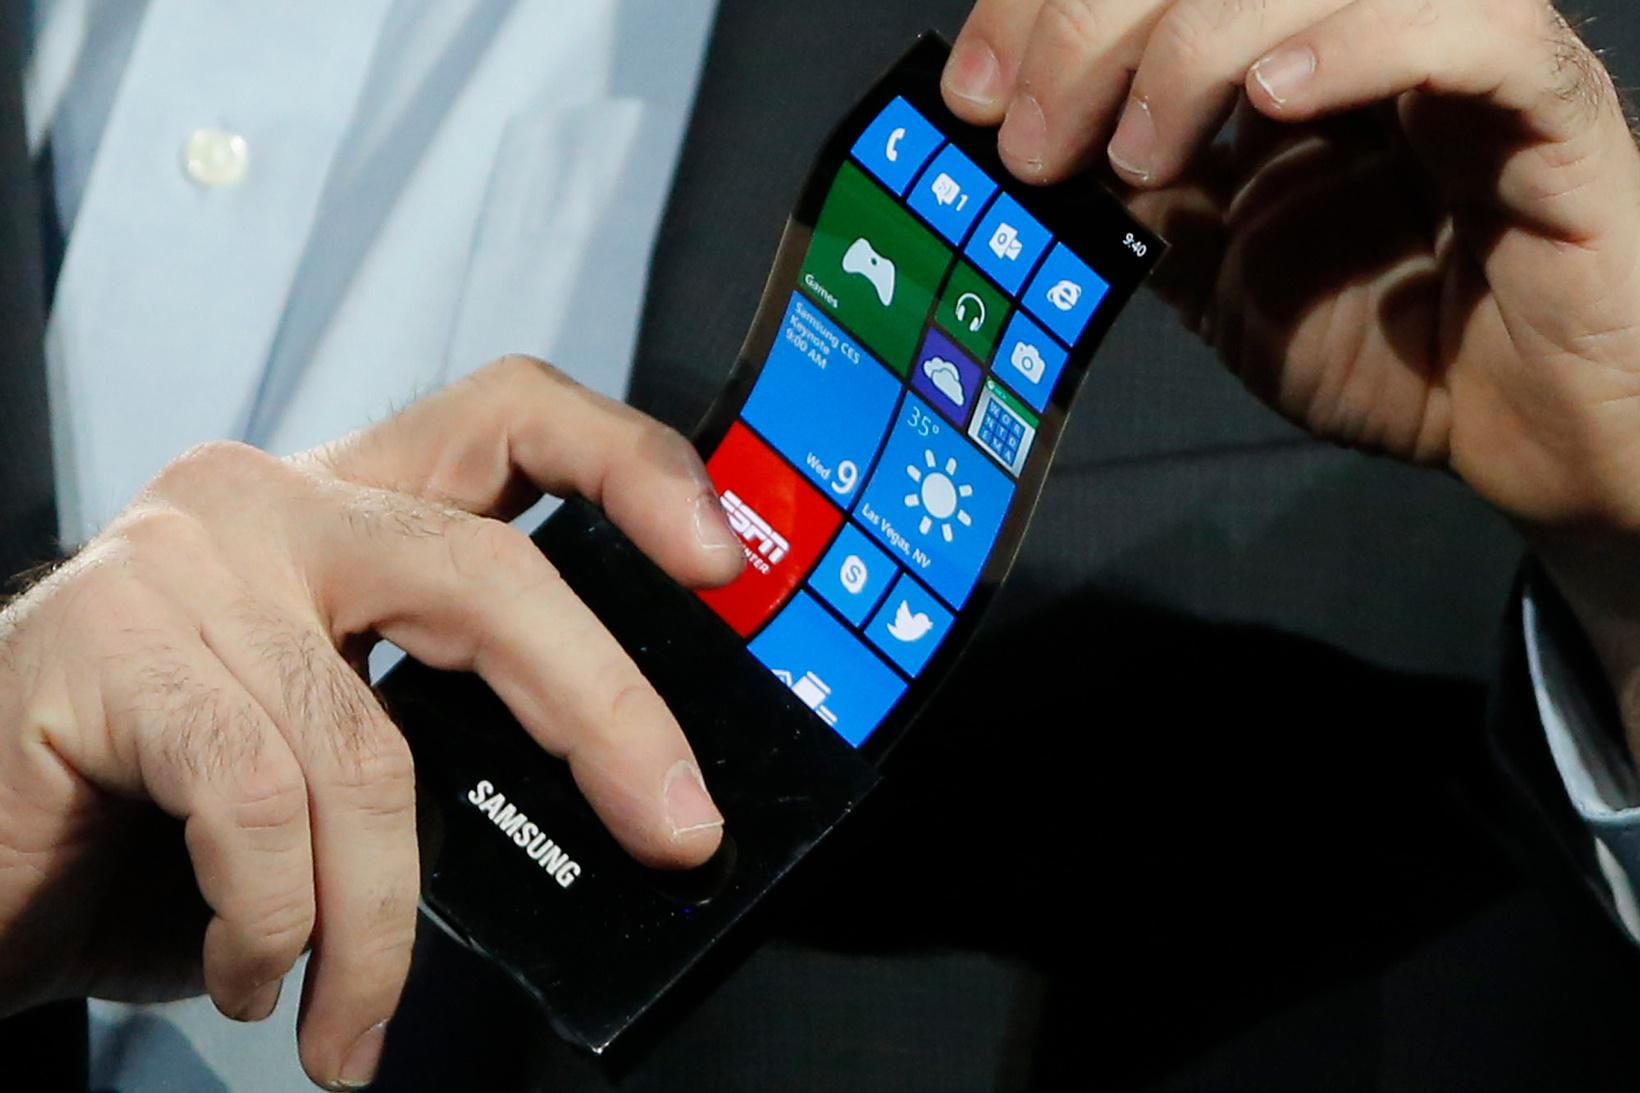 samsung-2016-foldable-smartphone-patent-1